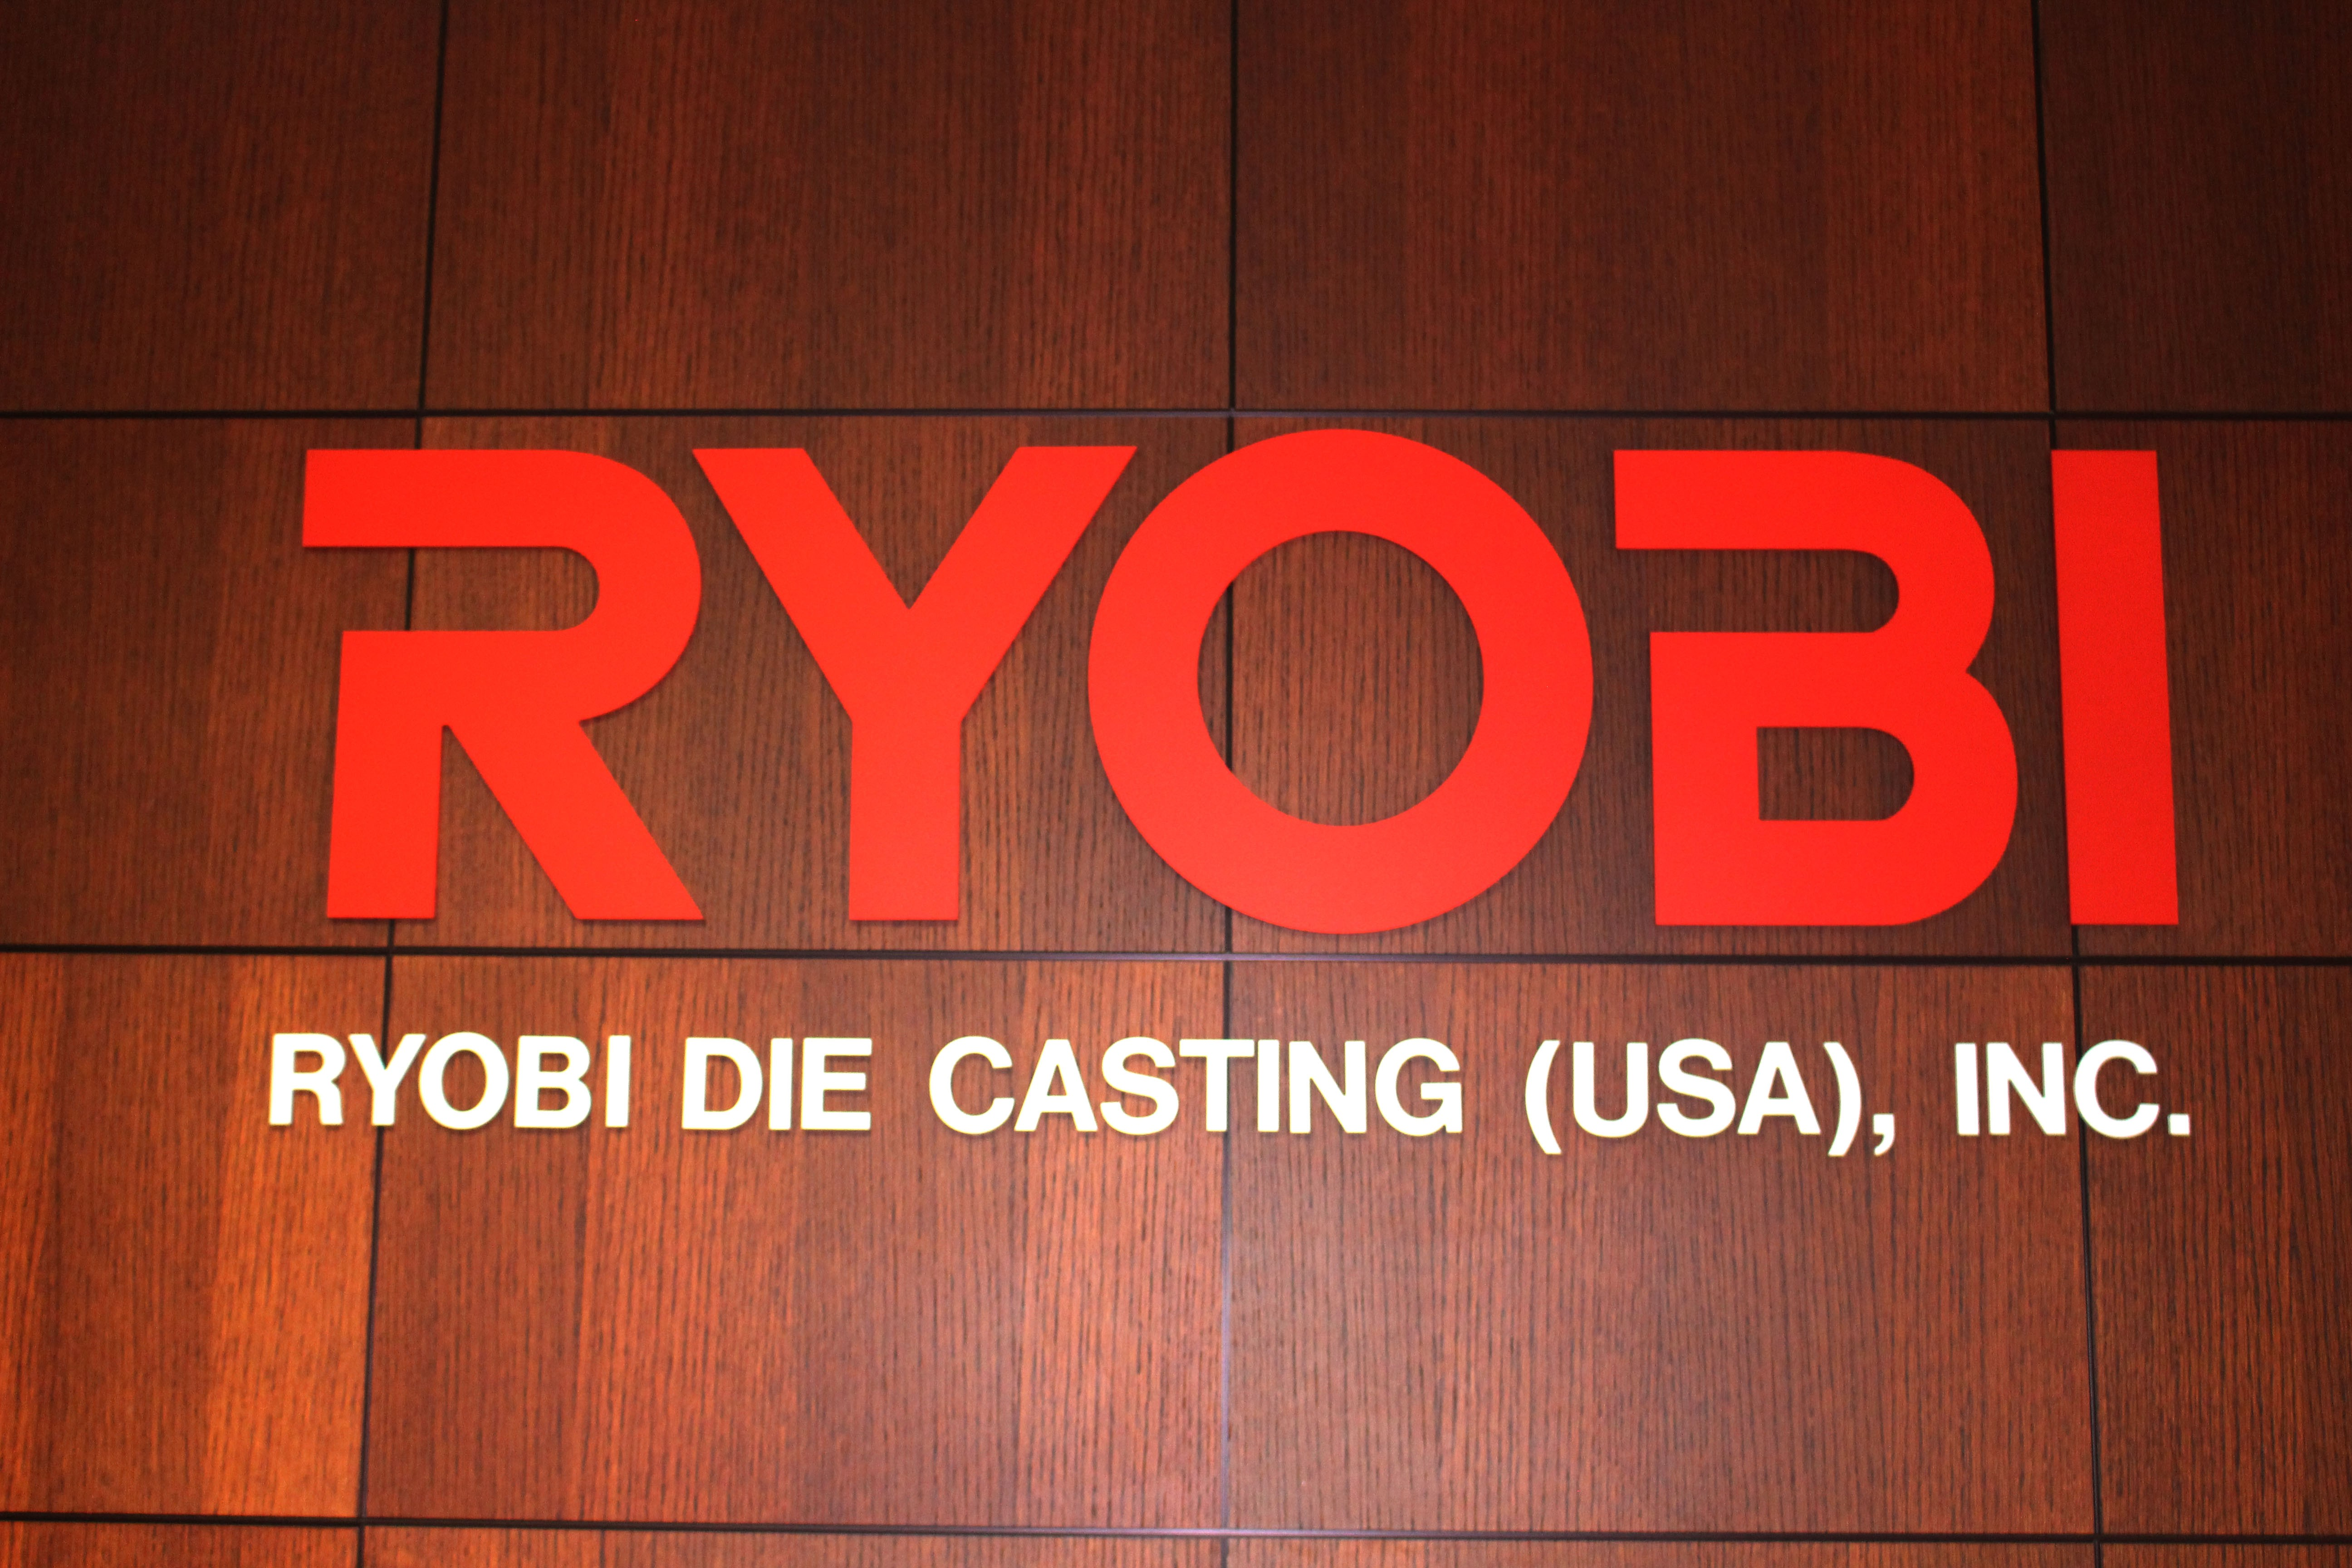 Ryobi Die Casting, Inc  | LinkedIn